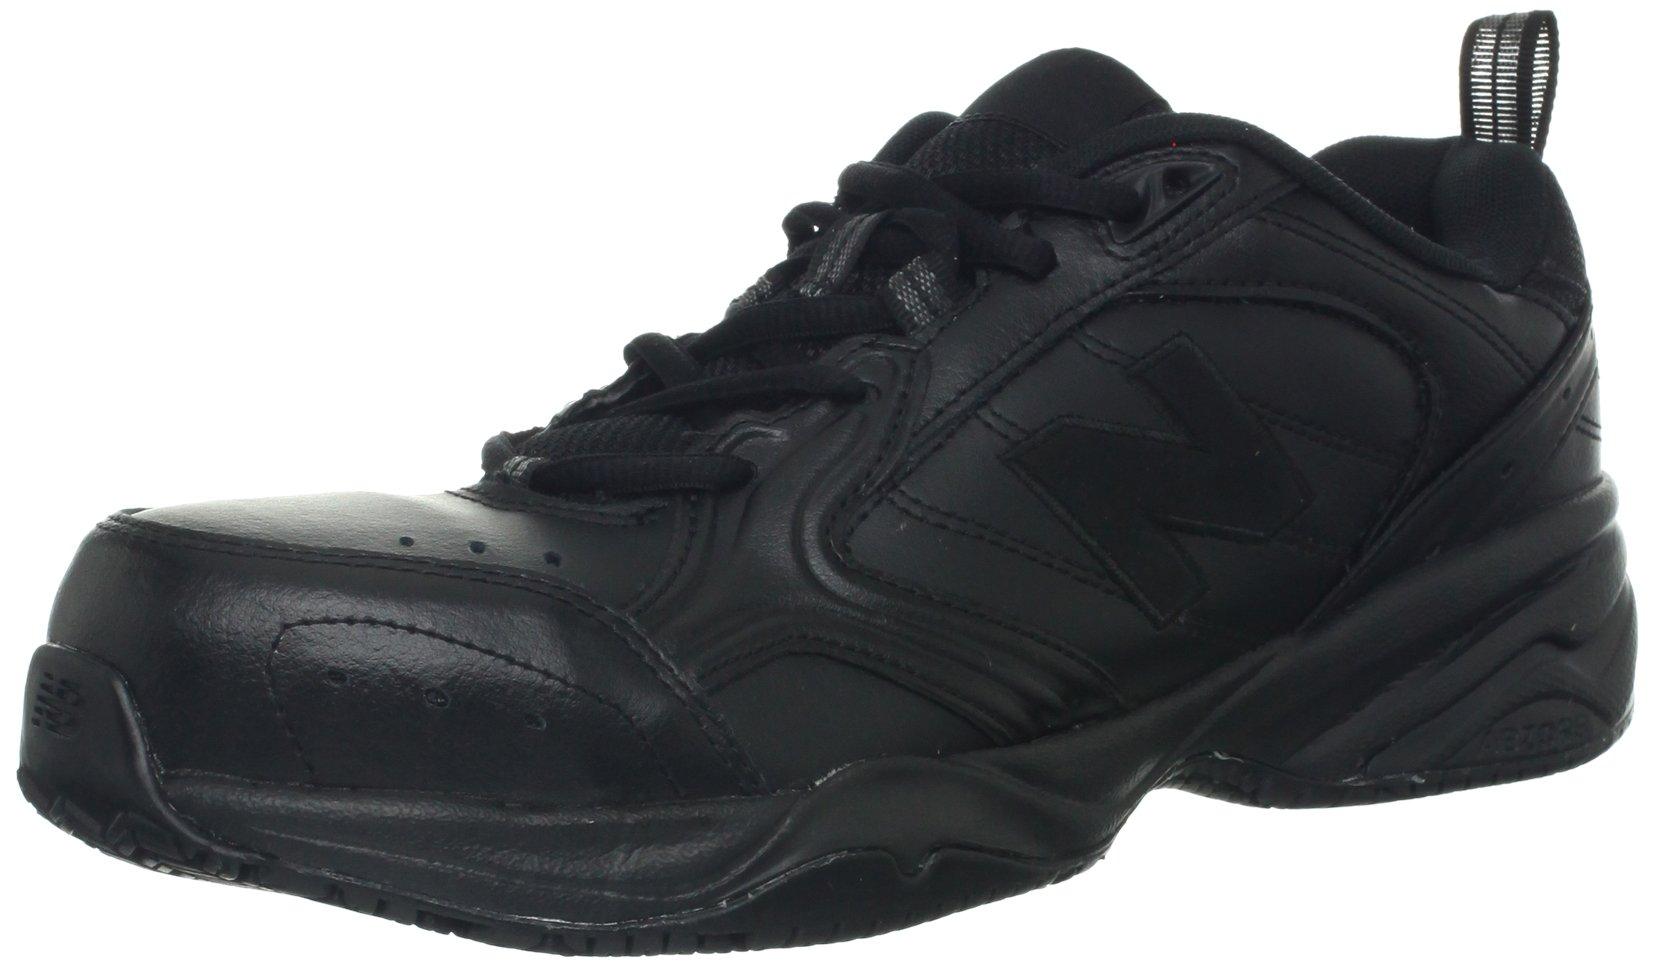 New Balance Men's MID627 Steel-Toe Work Shoe,Black,10 2E US by New Balance